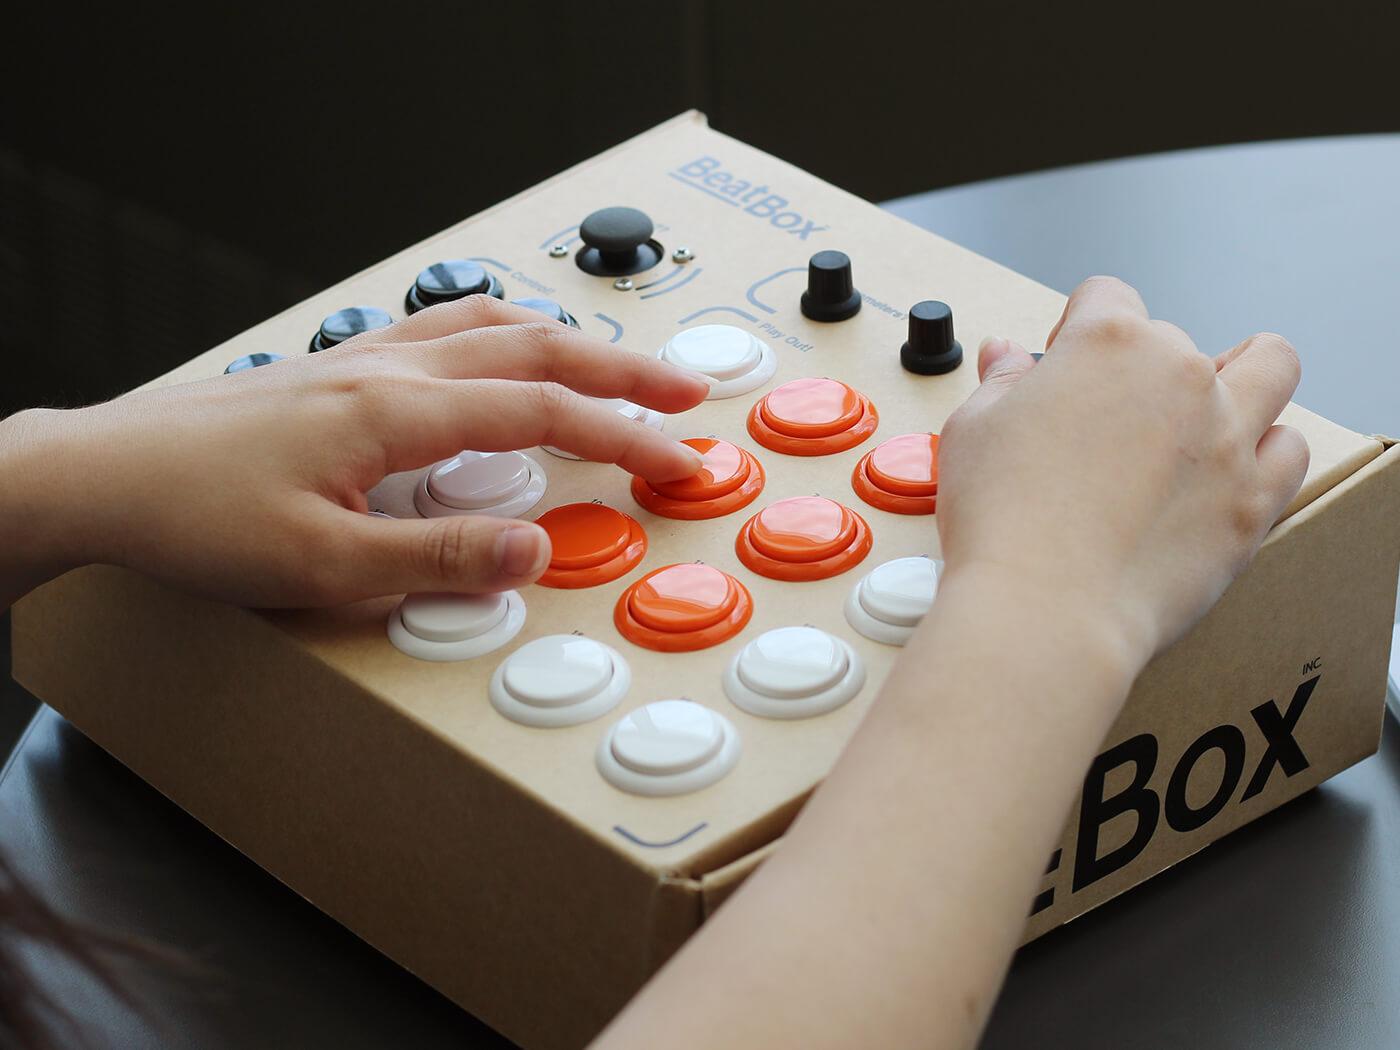 Rhythmo's BeatBox is a cardboard drum machine